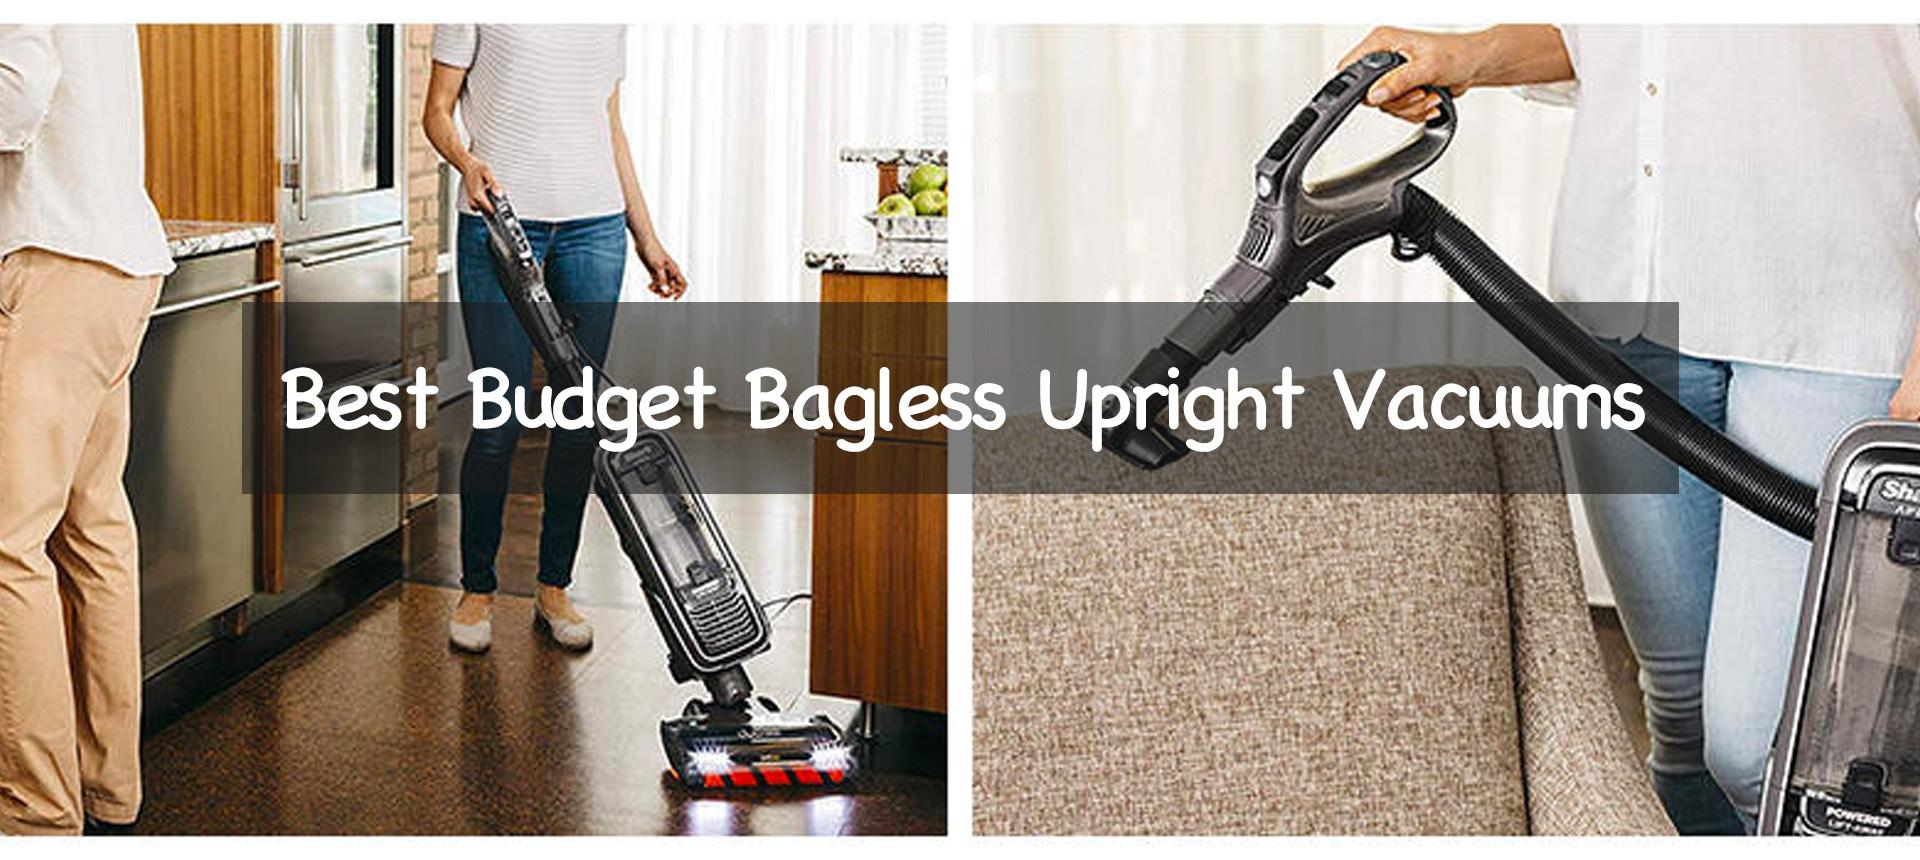 Best Budget Bagless Upright Vacuums